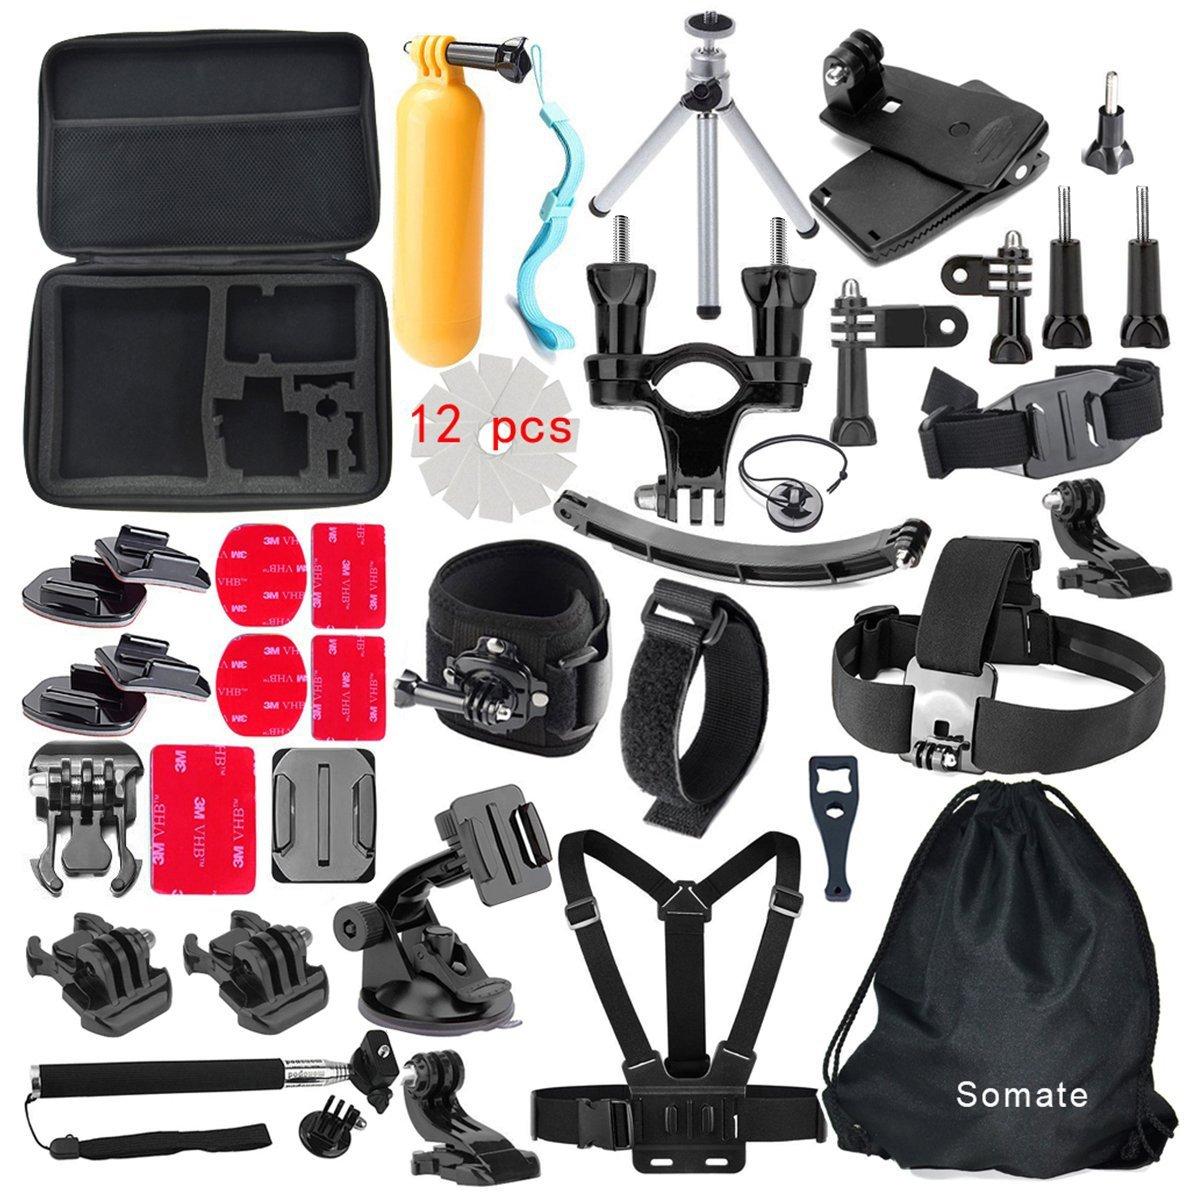 4K Action Camera Accessories Kit for Gopro Hero 5/4 Session Hero 3/2/1 Silver Black;Bundles for AKaso Ek7000; EKEN H9r Campark Wifi Underwater Cam; DBPower EX5000; SJCAM SJ4000 SJ5000 SJ6000